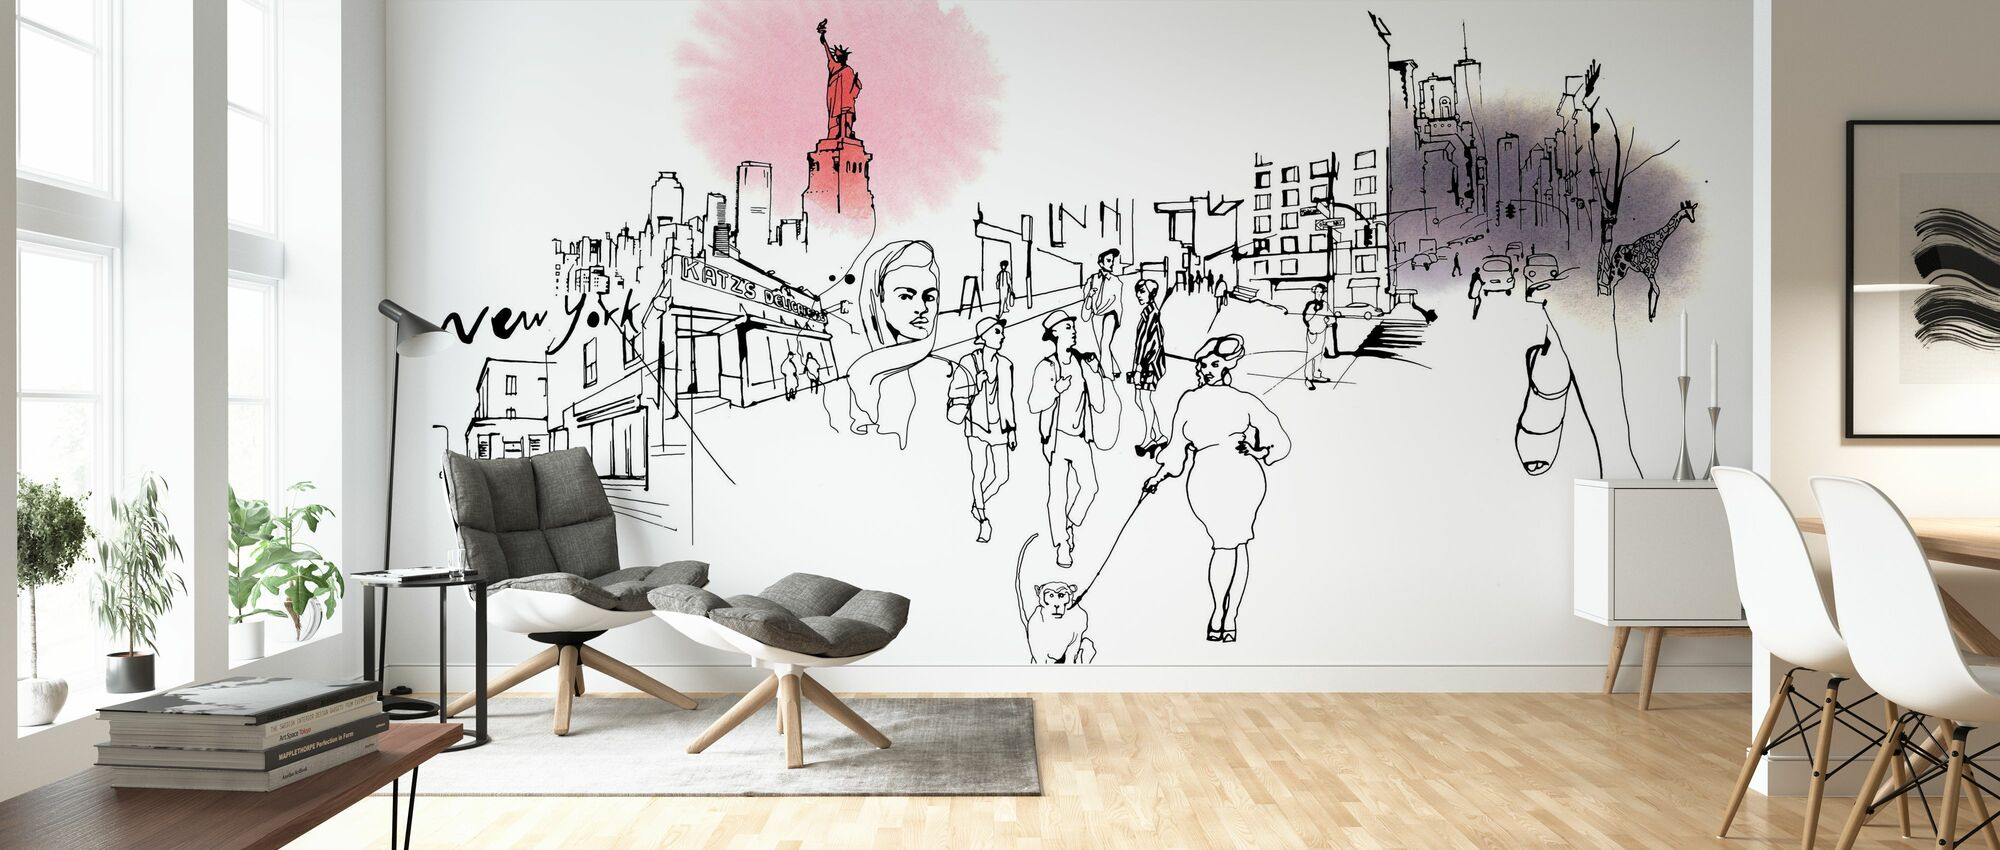 New York City - Katz's Delicatessen - Wallpaper - Living Room